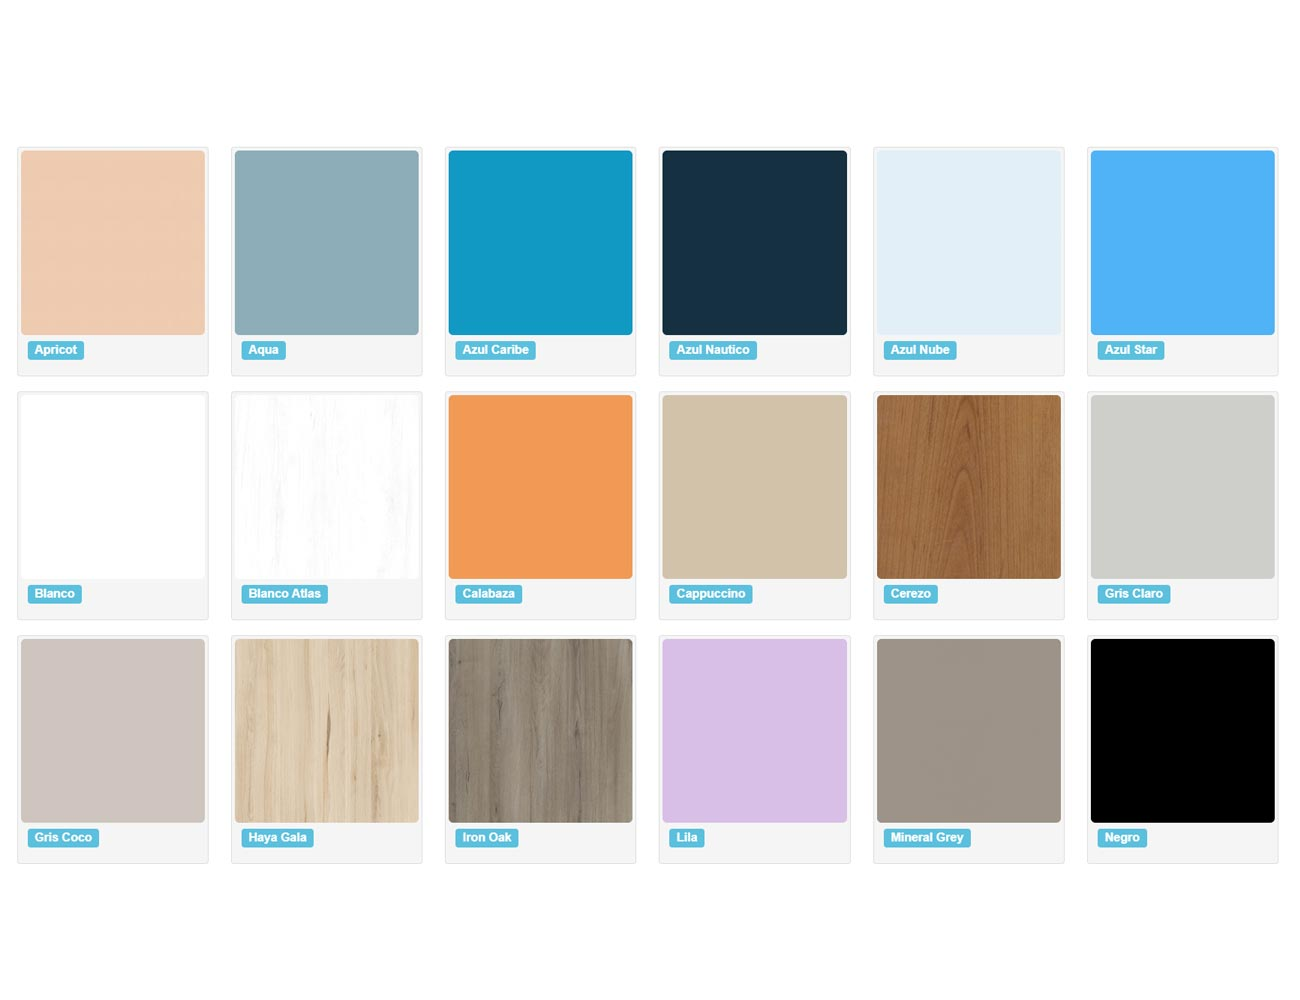 Colores214